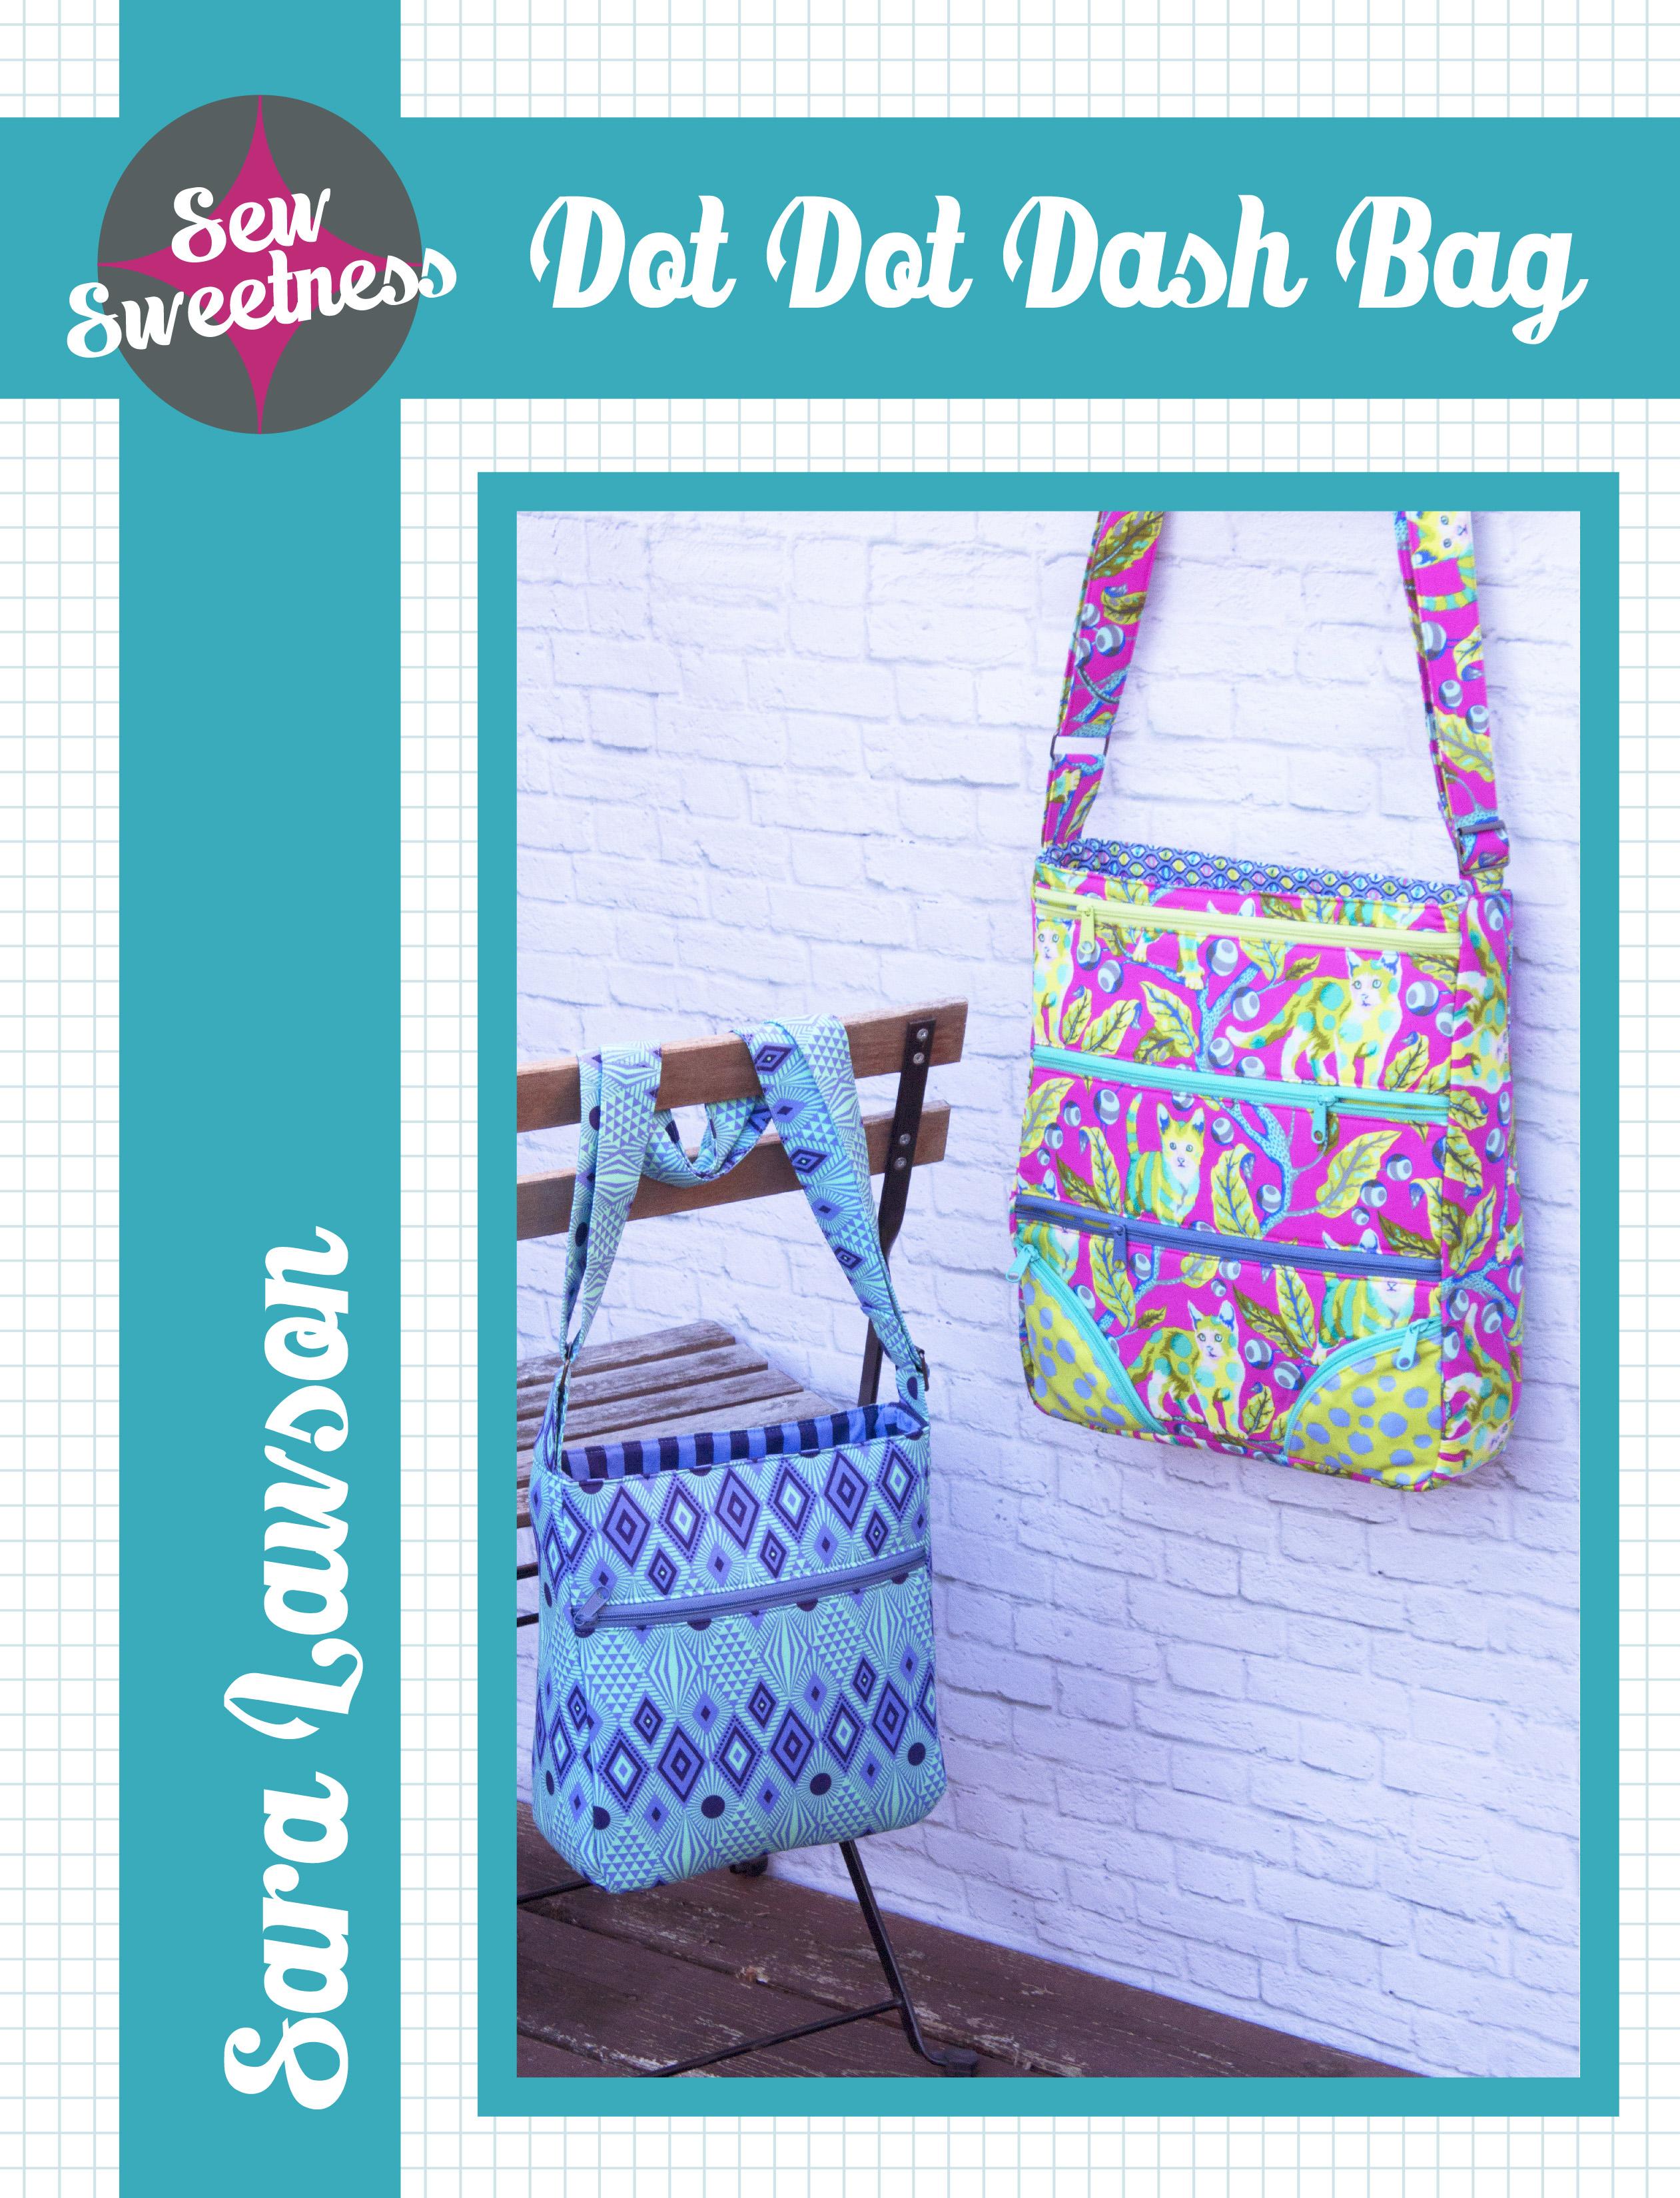 Sew Sweetness Dot Dot Dash sewing pattern